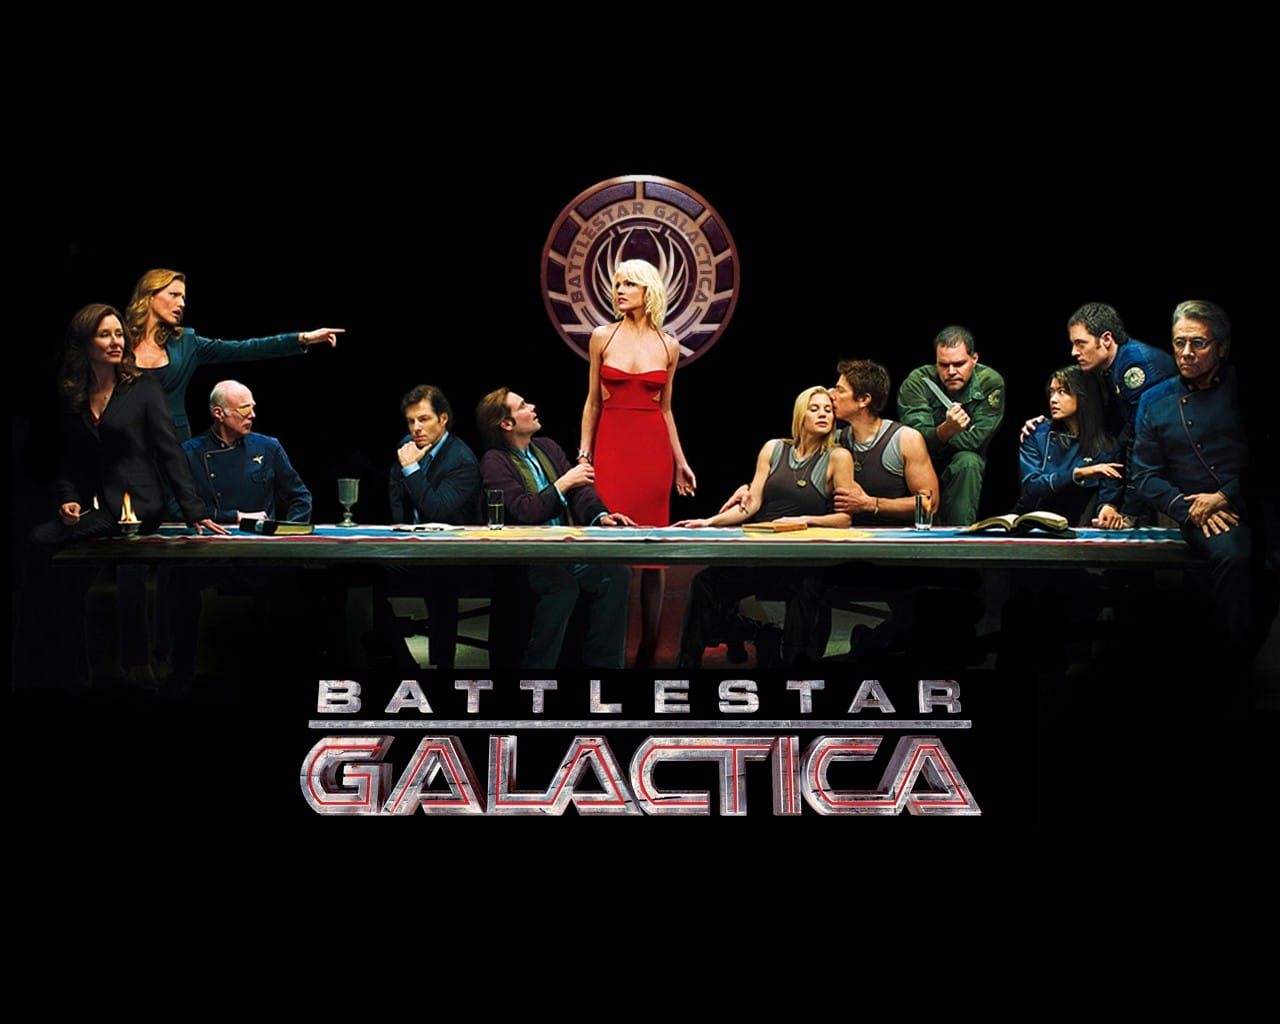 Battlestar-Galactica.jpeg